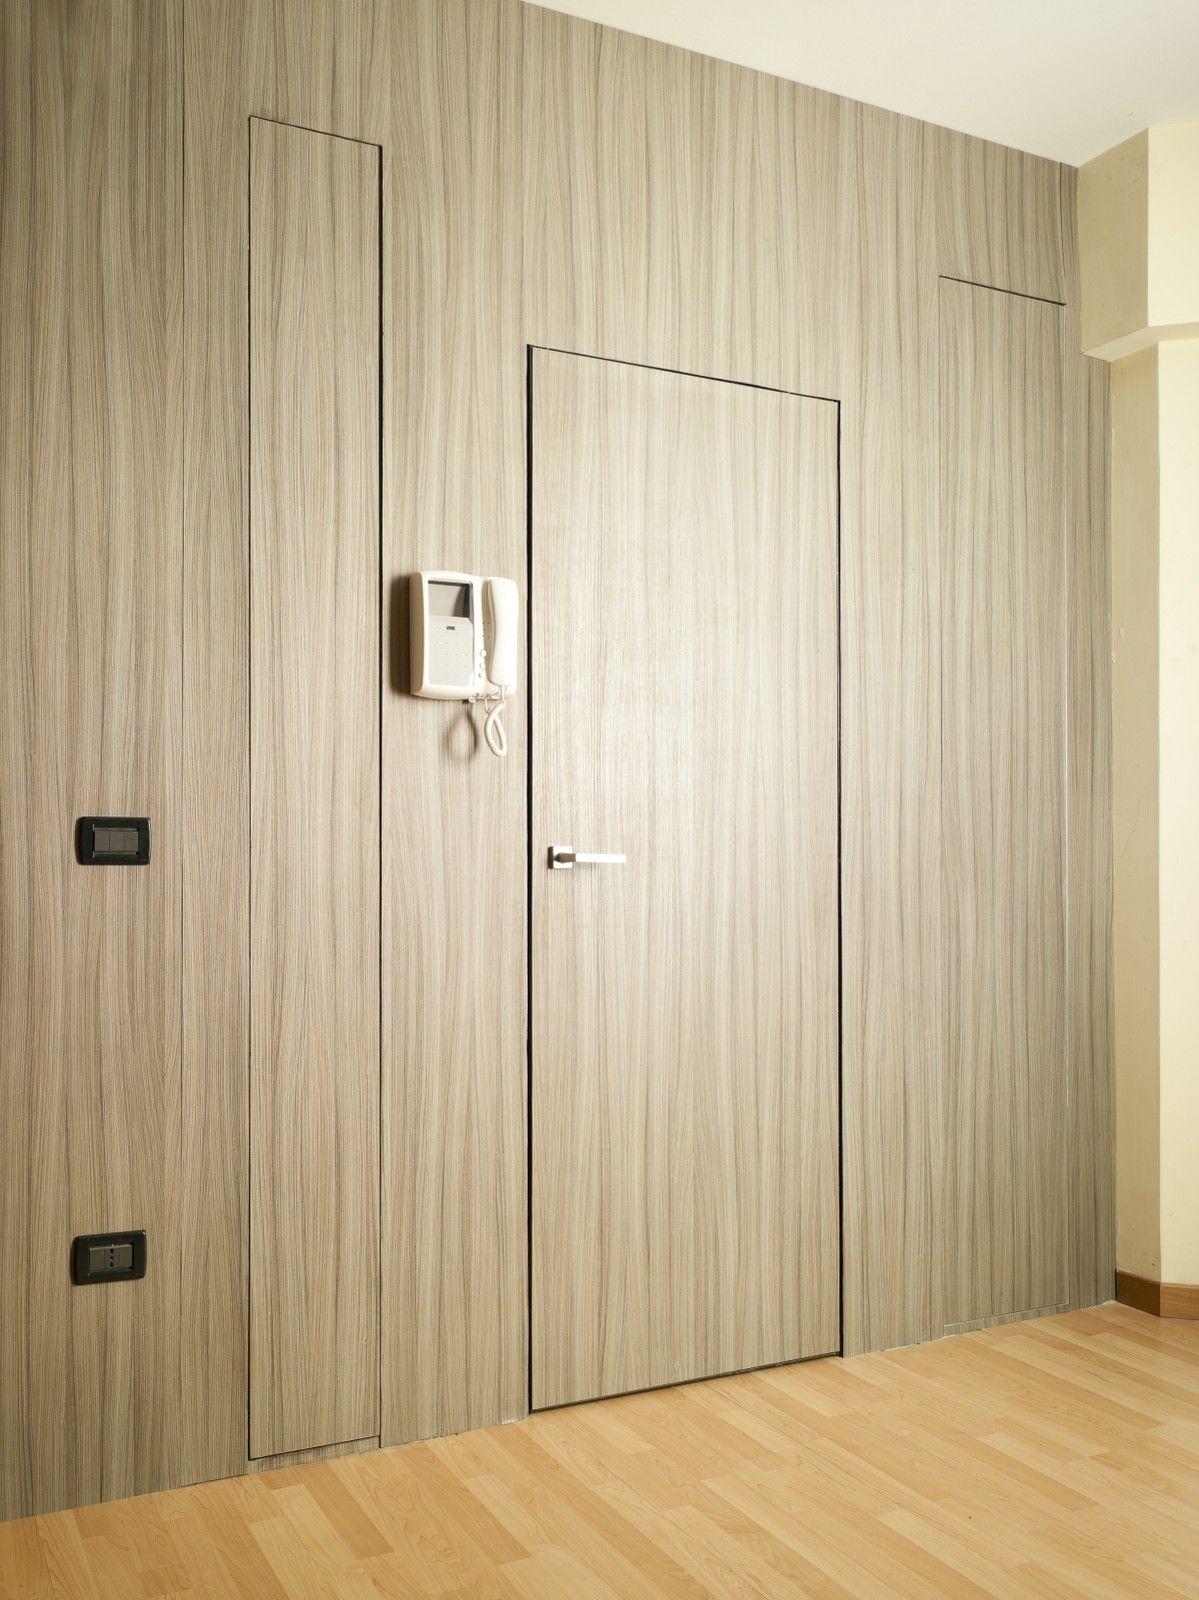 Porta rasomuro (porta, rasomuro, muro) - Social Shopping su ...